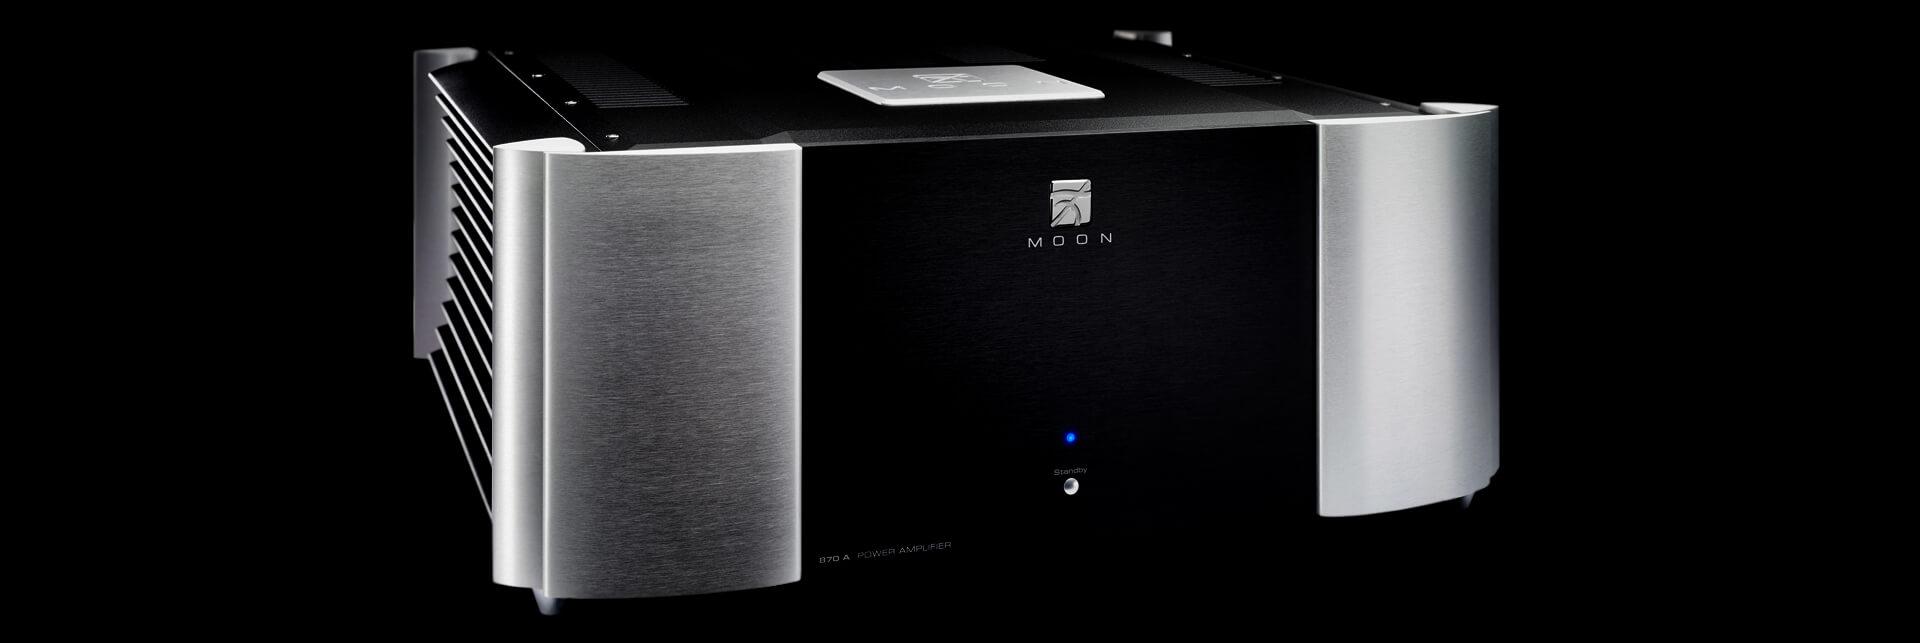 Power Amp 870a Best Audio Amplifier Moon Simaudio Archives Circuit Design